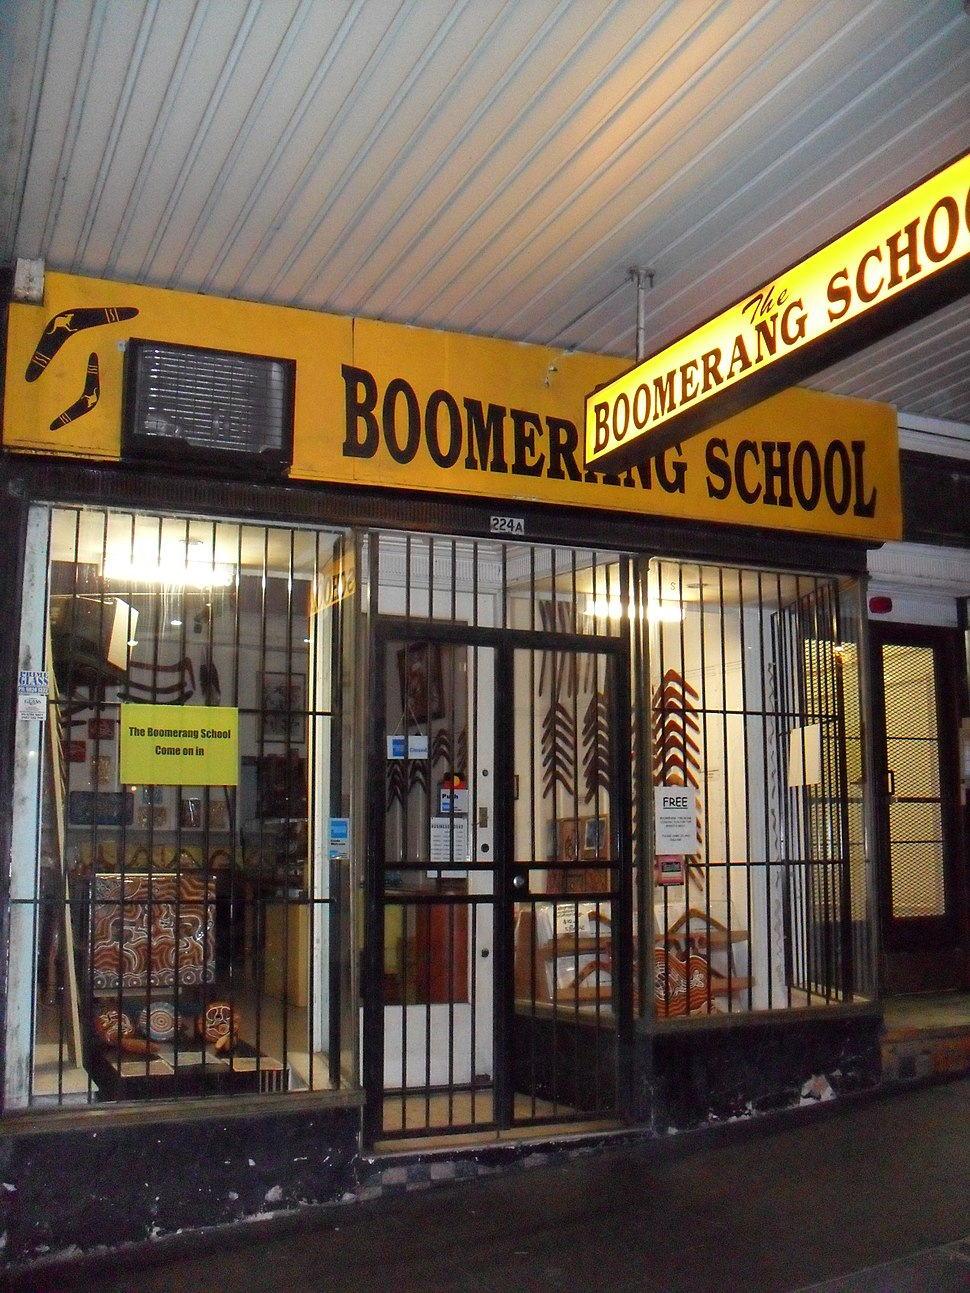 Boomerang School